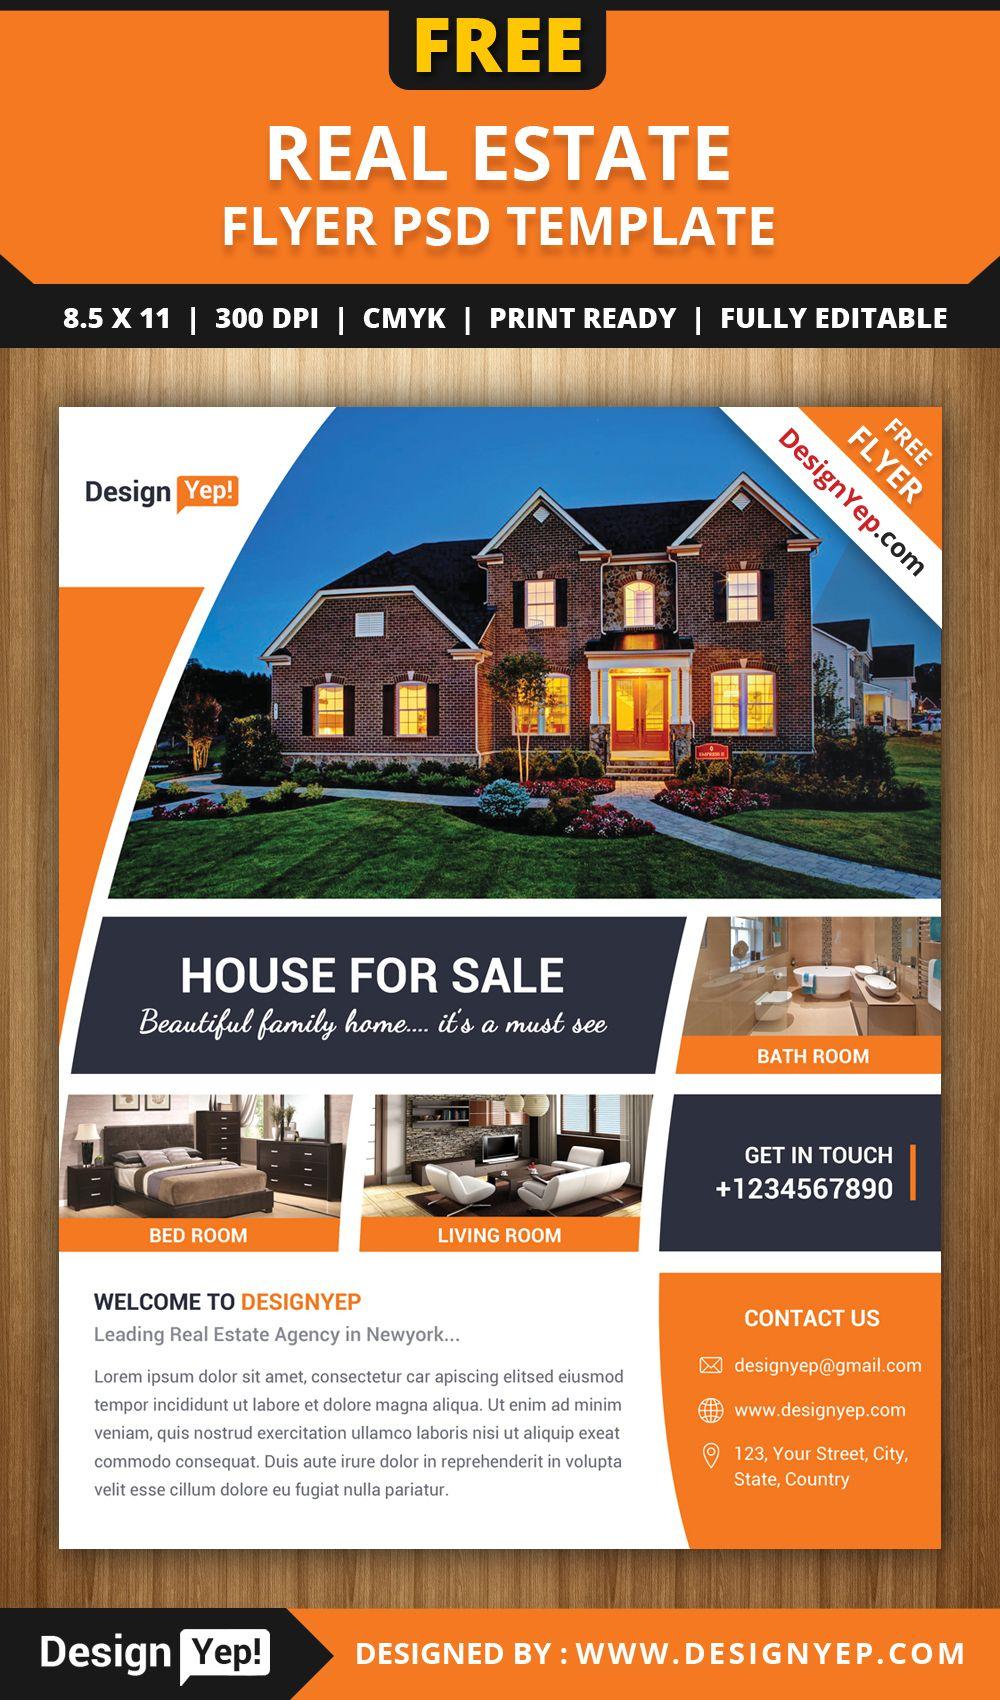 Free-Real-Estate-Flyer-Psd-Template-7861-Designyep | Free Flyers - Free Printable Real Estate Flyer Templates